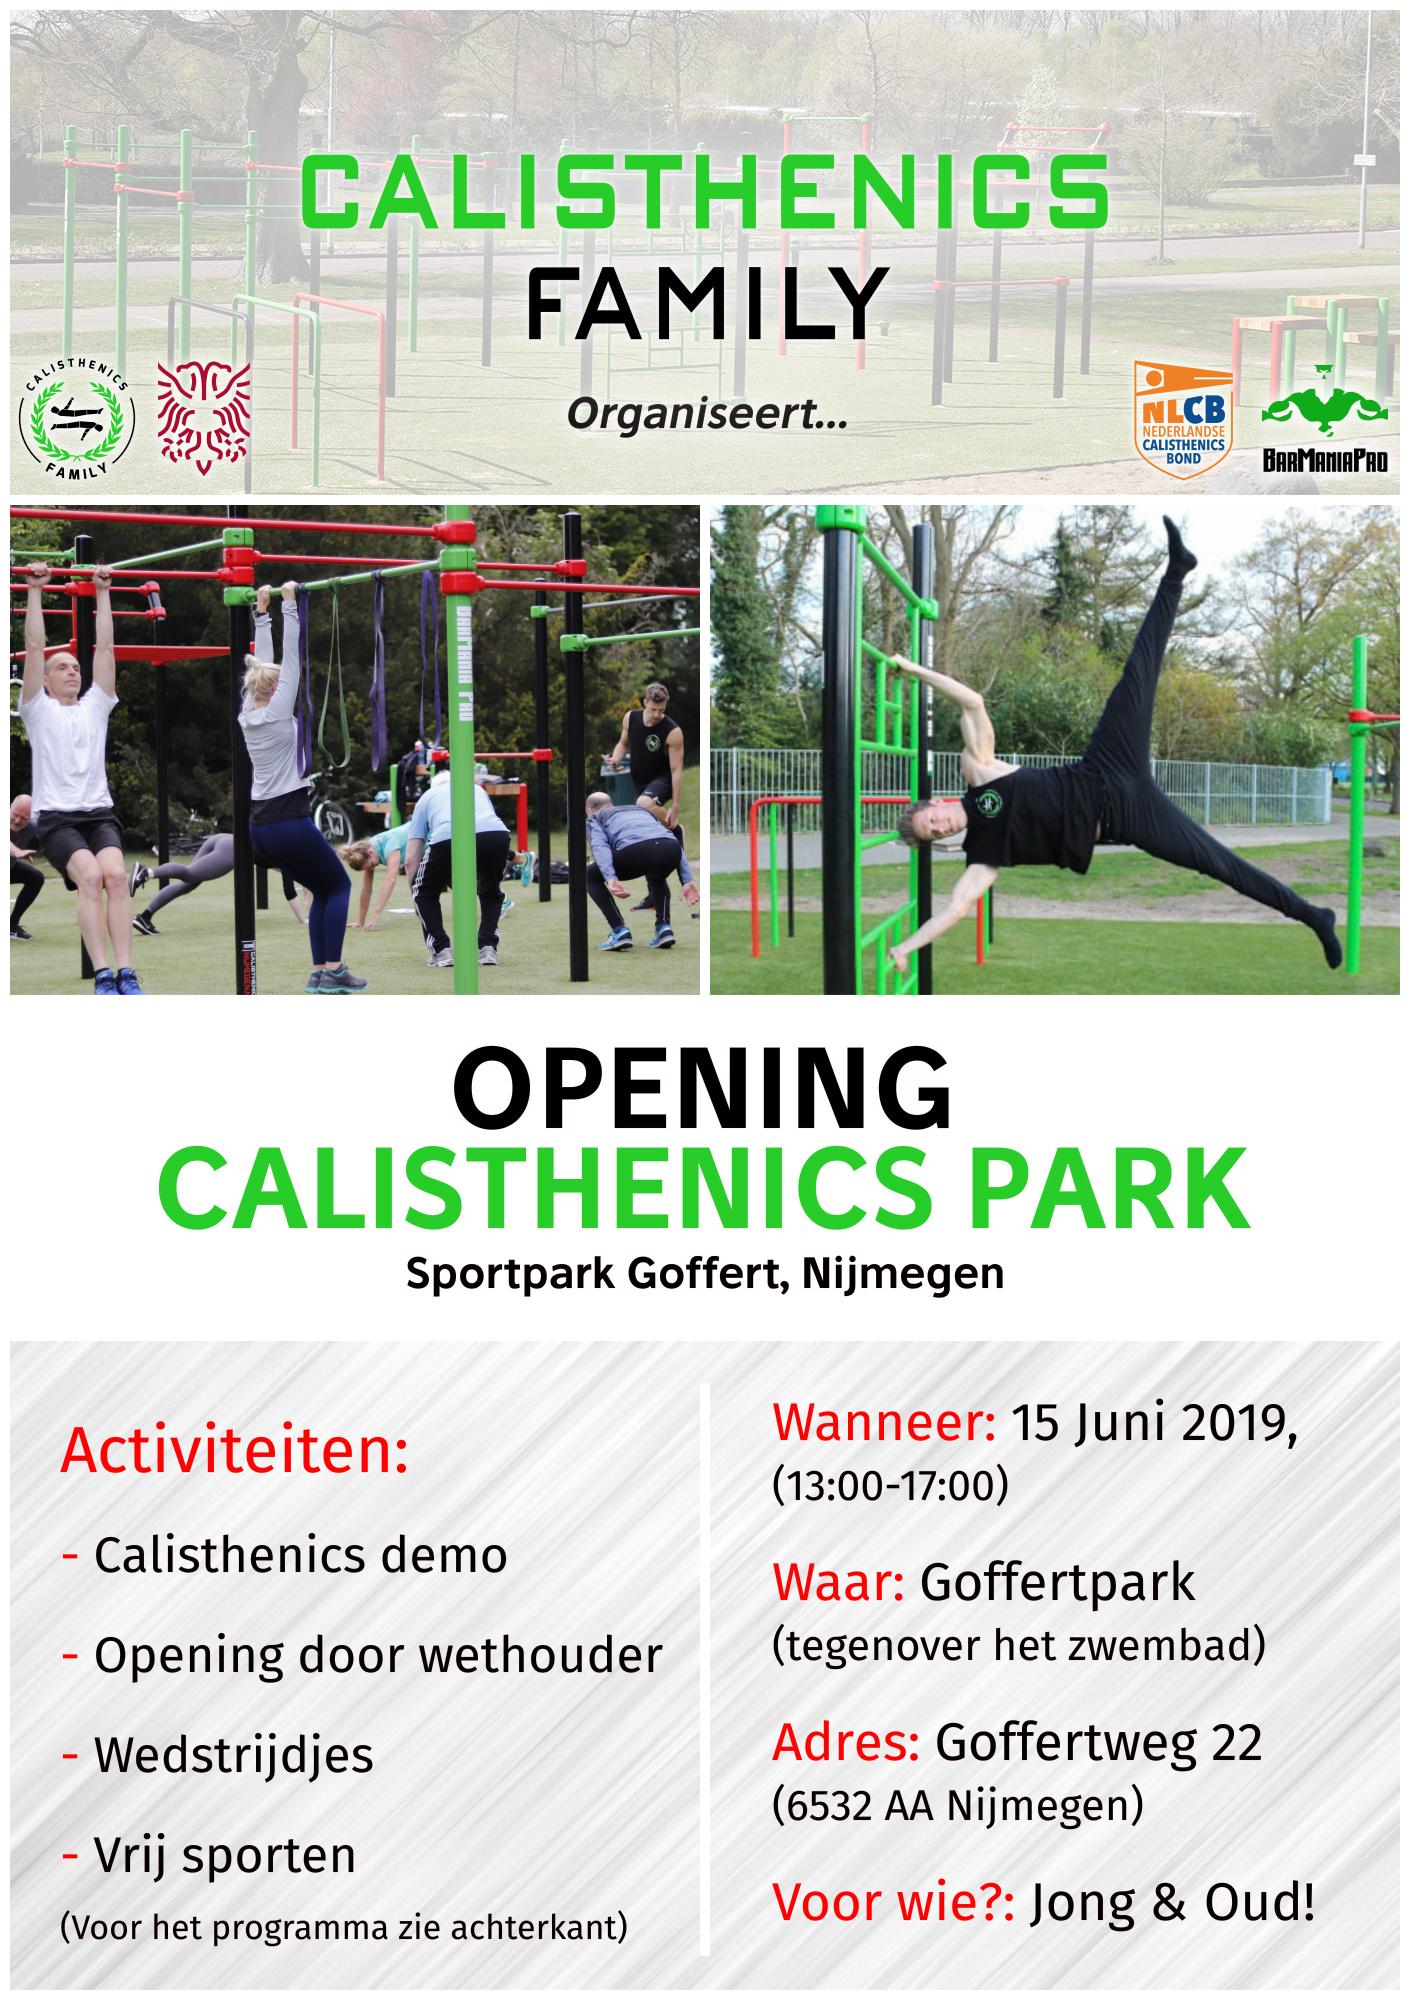 calisthenics park nijmegen